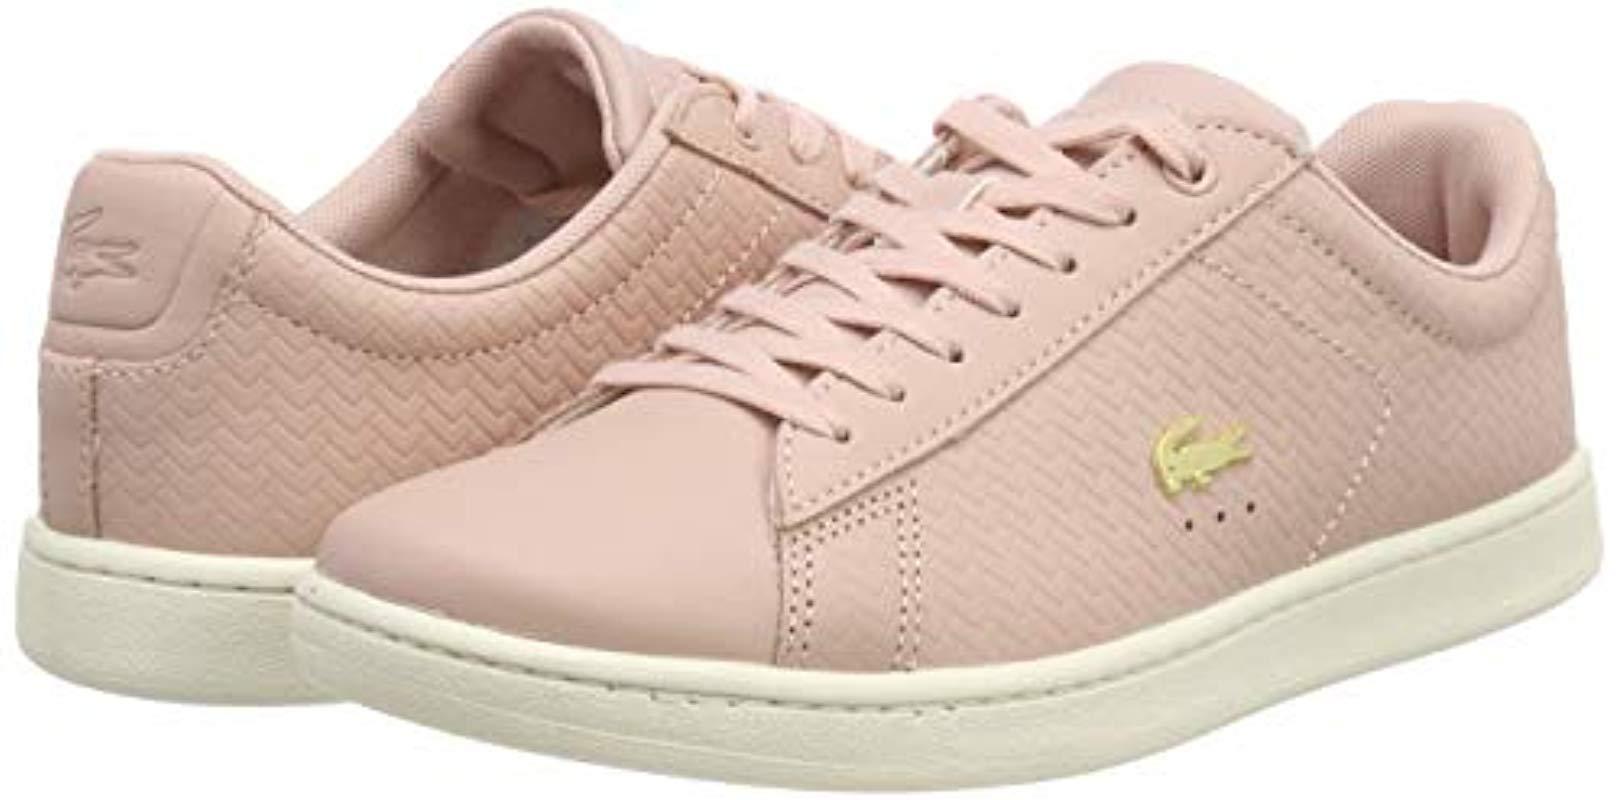 Damen Carnaby Evo 119 3 SFA Sneaker